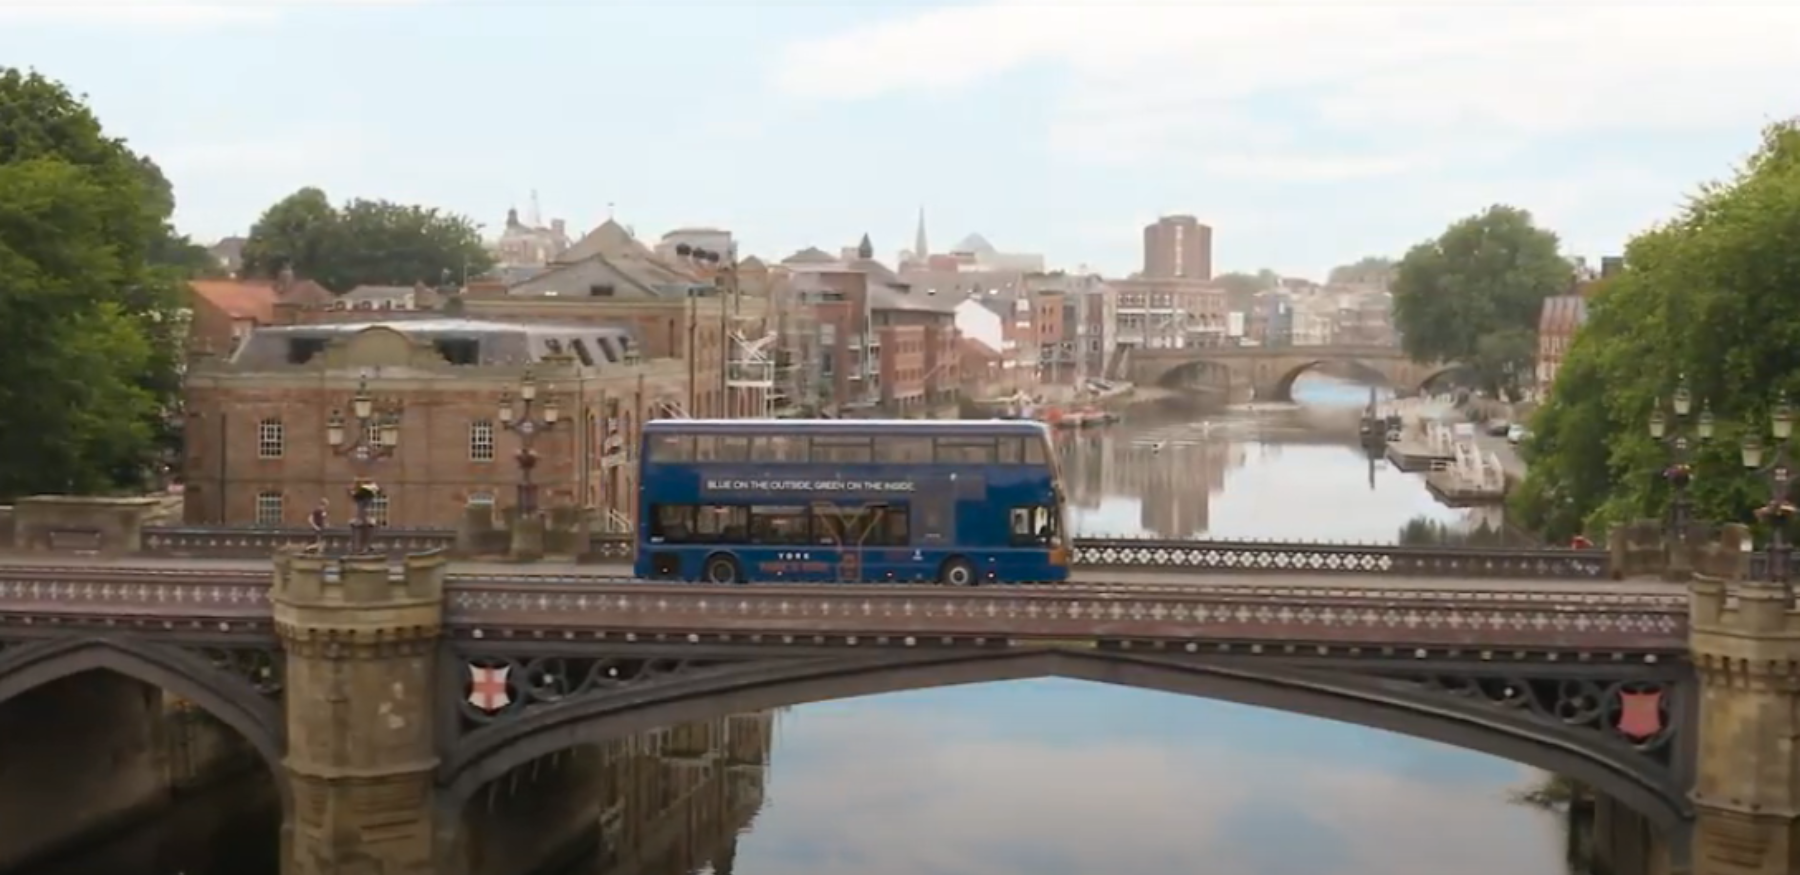 Visit York First York TV Advert Screenshot 2